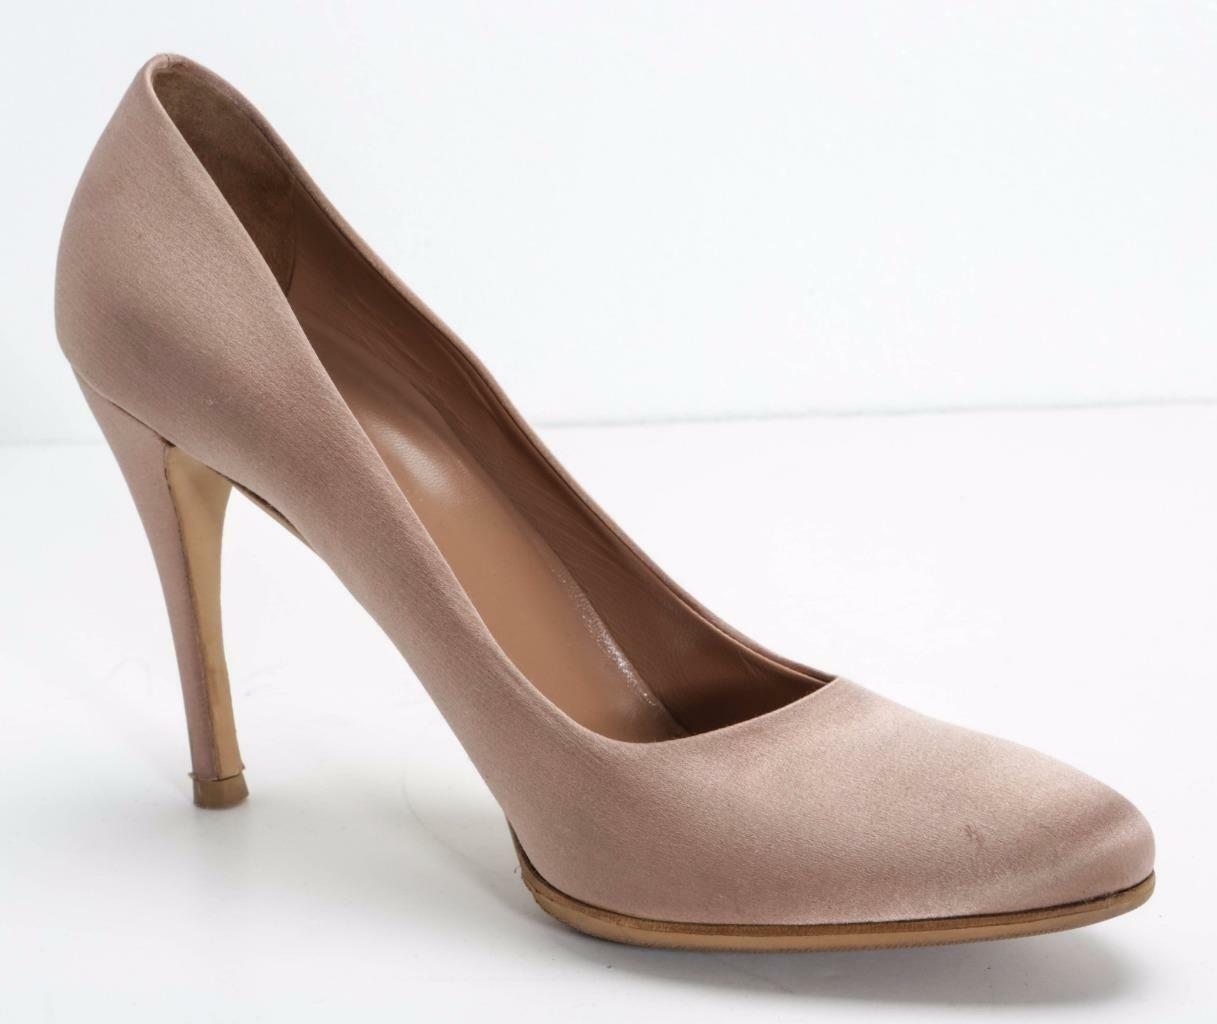 PRADA damen Antique Rosa Beige Satin Round-Toe Classic Pump High-Heel 10.5-40.5